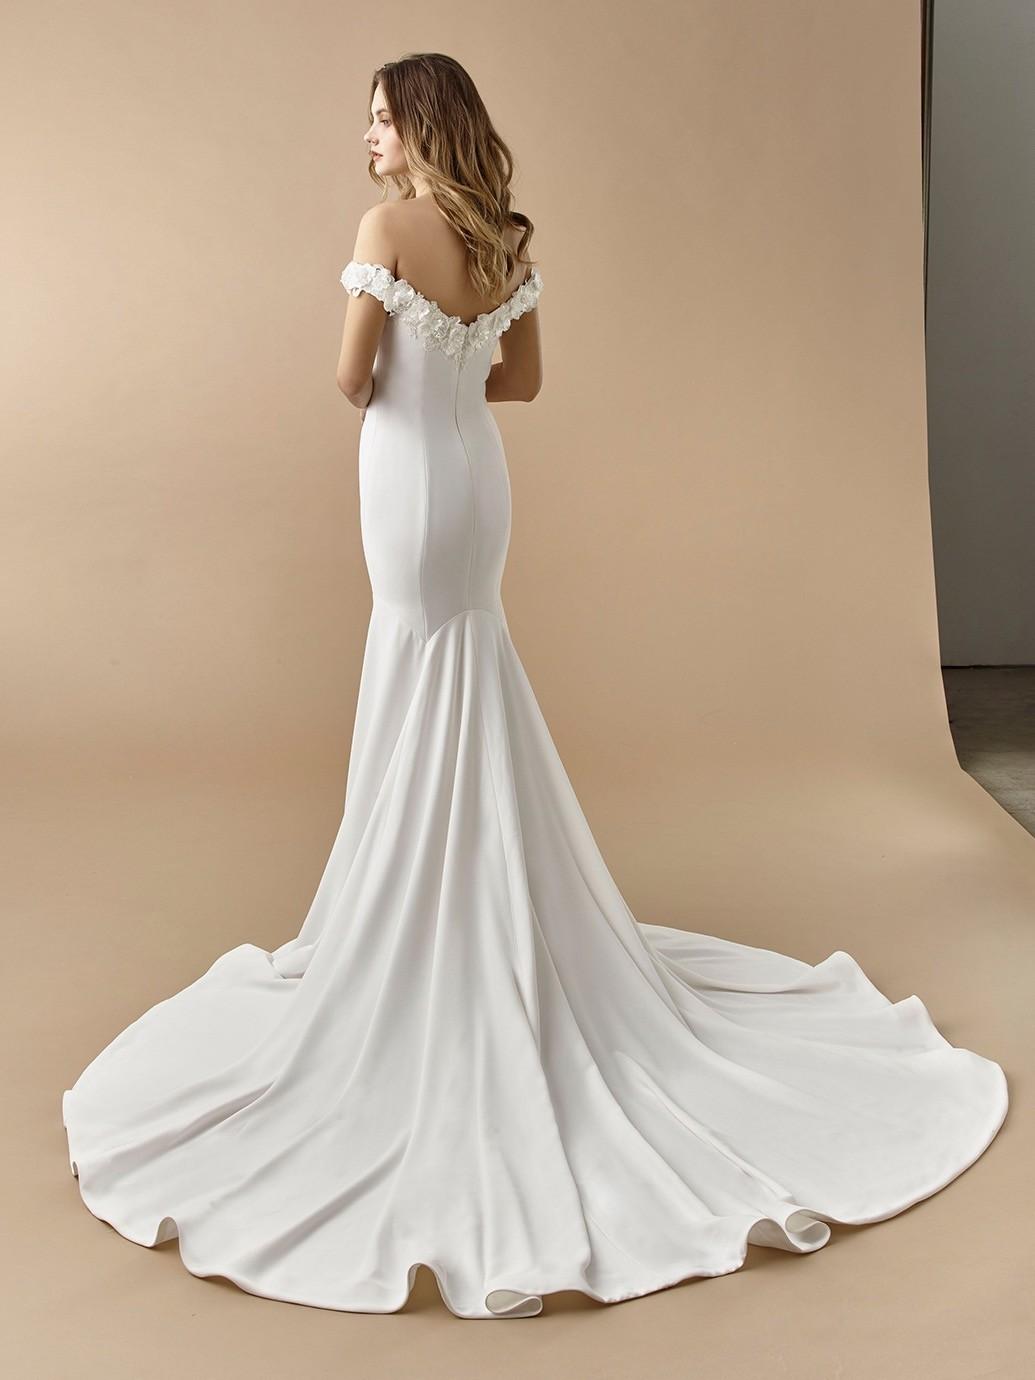 Brautkleid Modell BT20-14 aus der Beautiful Bridal Kollektion 2020